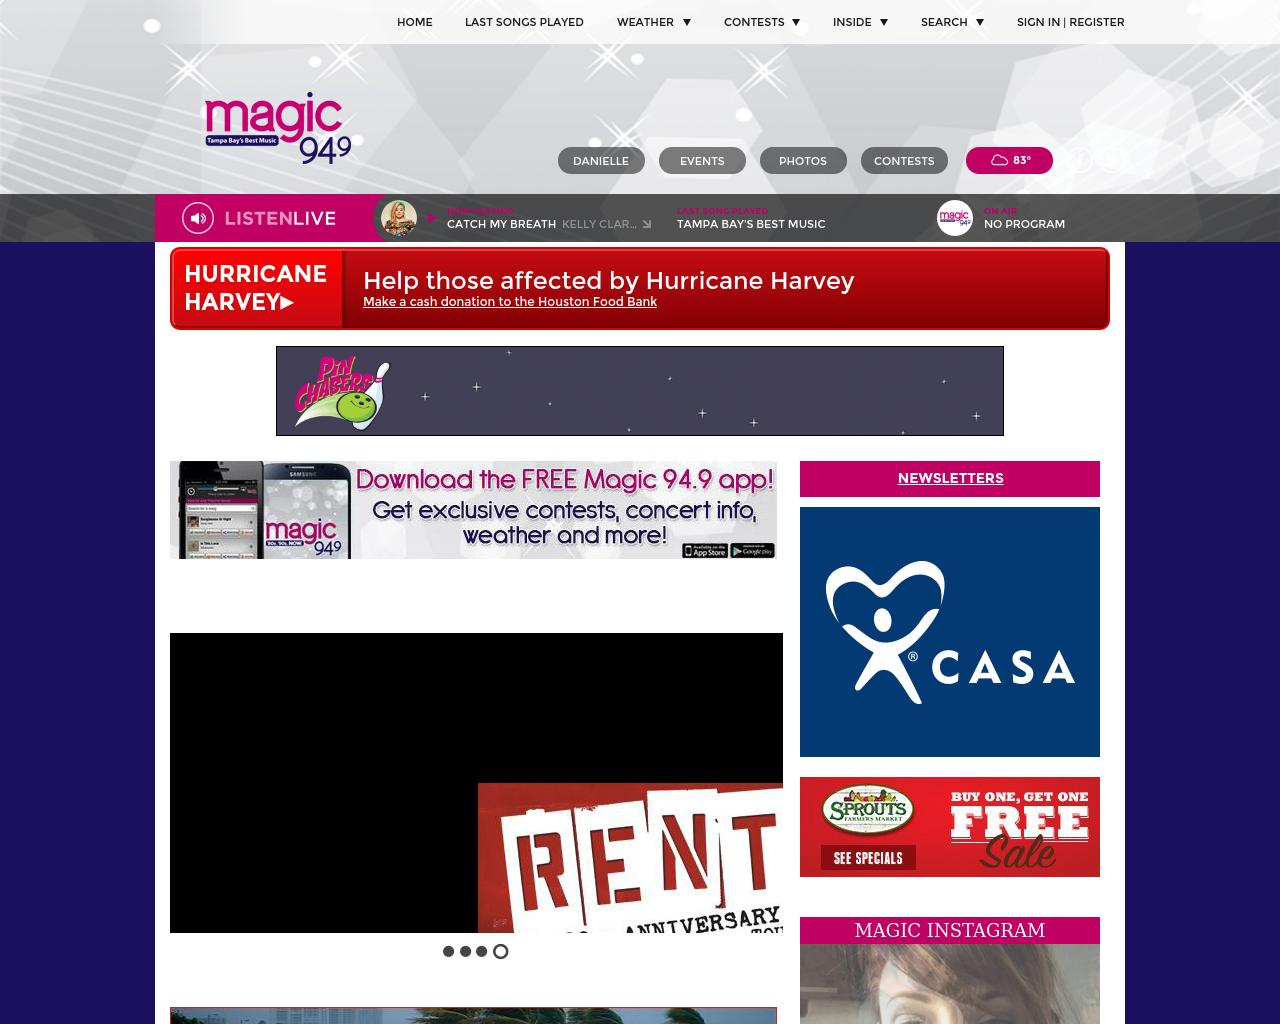 Magic-949-Advertising-Reviews-Pricing